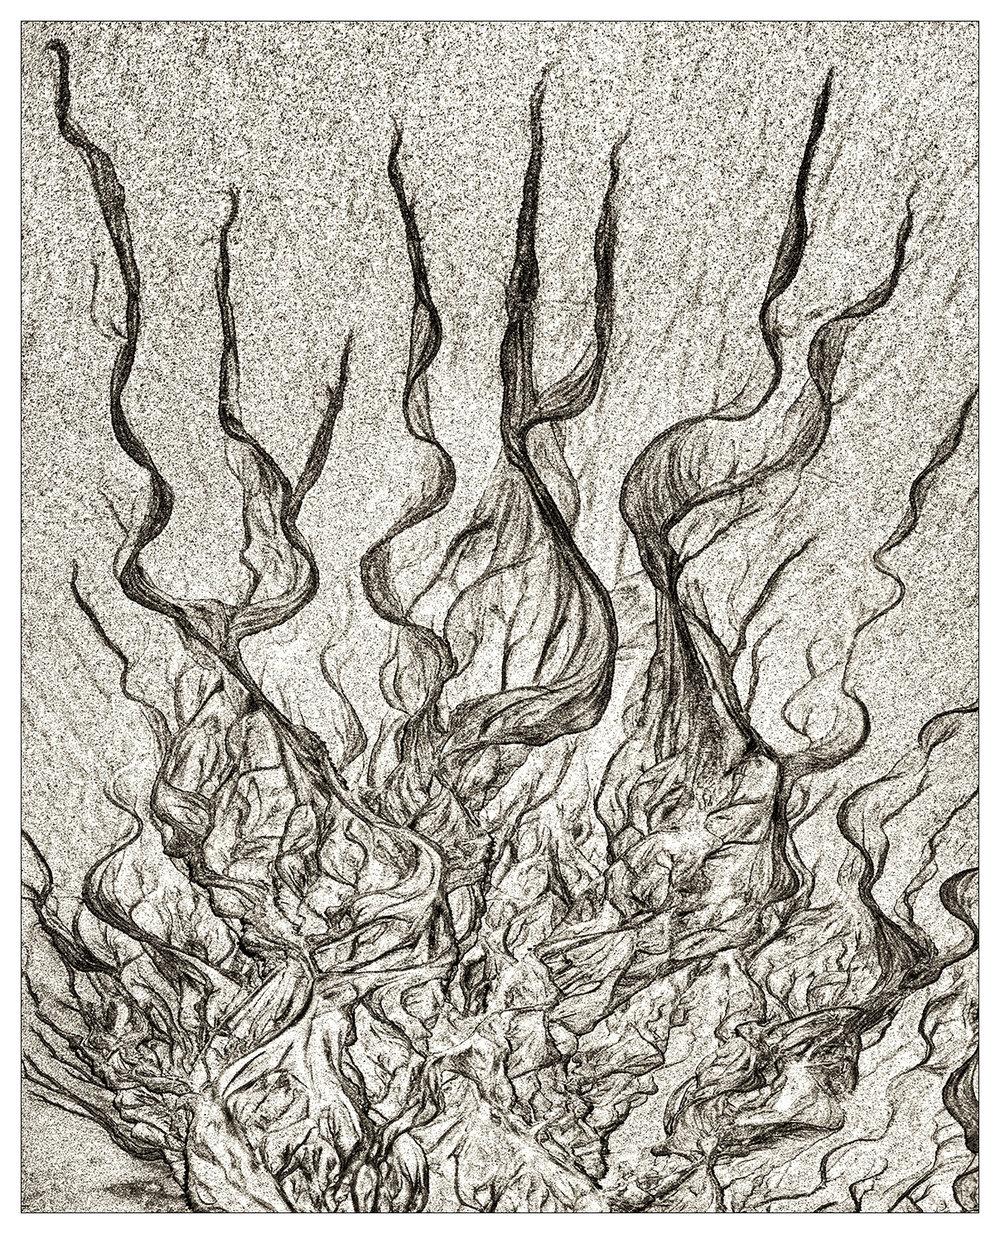 Sand Art - Flames